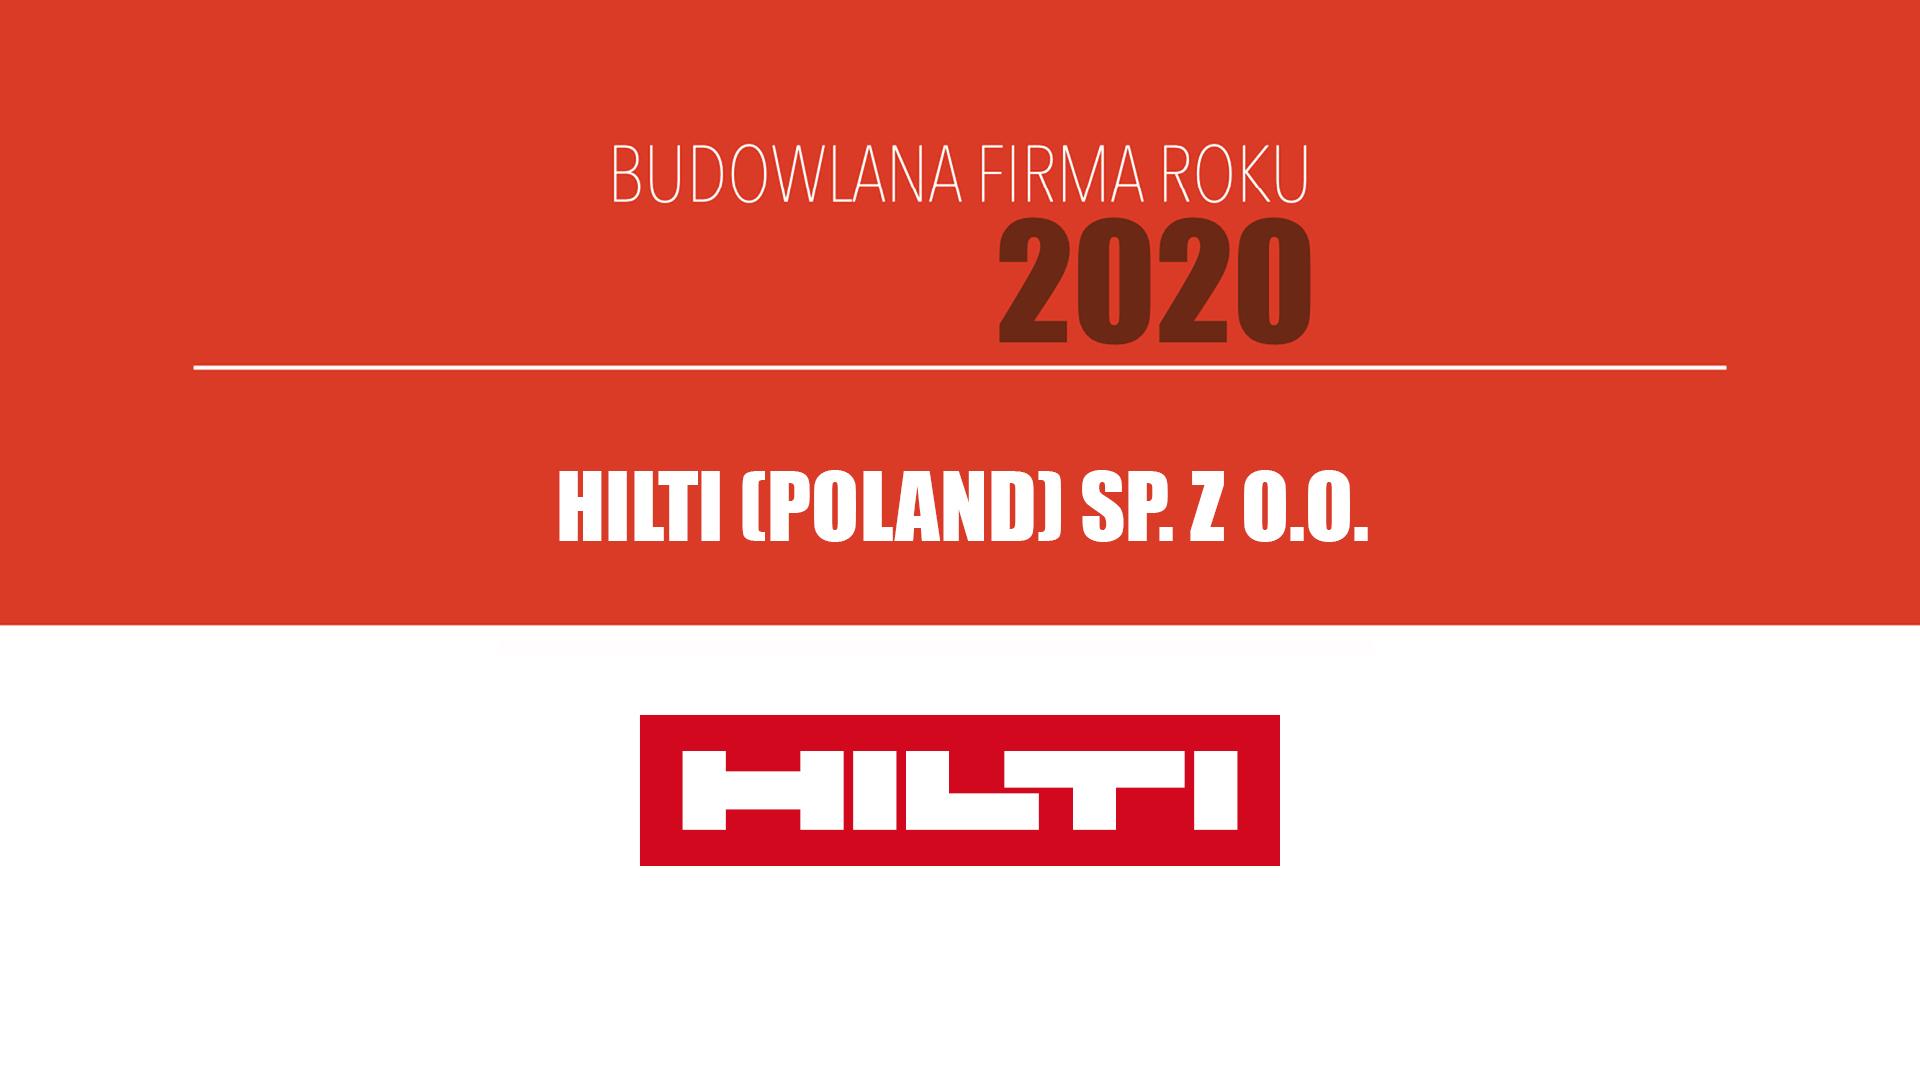 HILTI (POLAND) SP. Z O.O. – Budowlana Firma Roku 2020